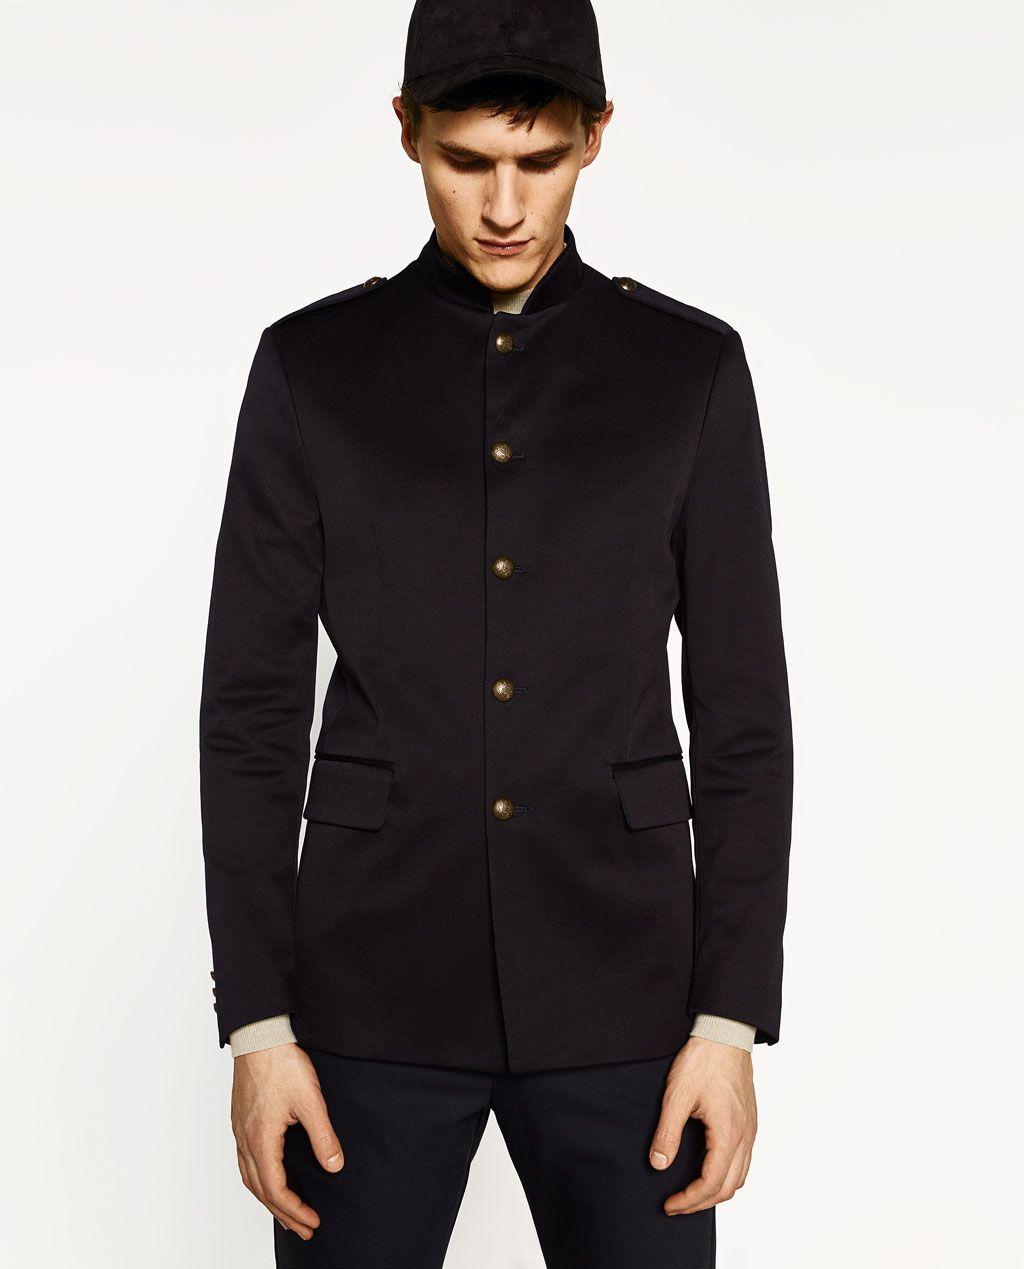 Image 1 Of Military Blazer From Zara In 2020 Blazers For